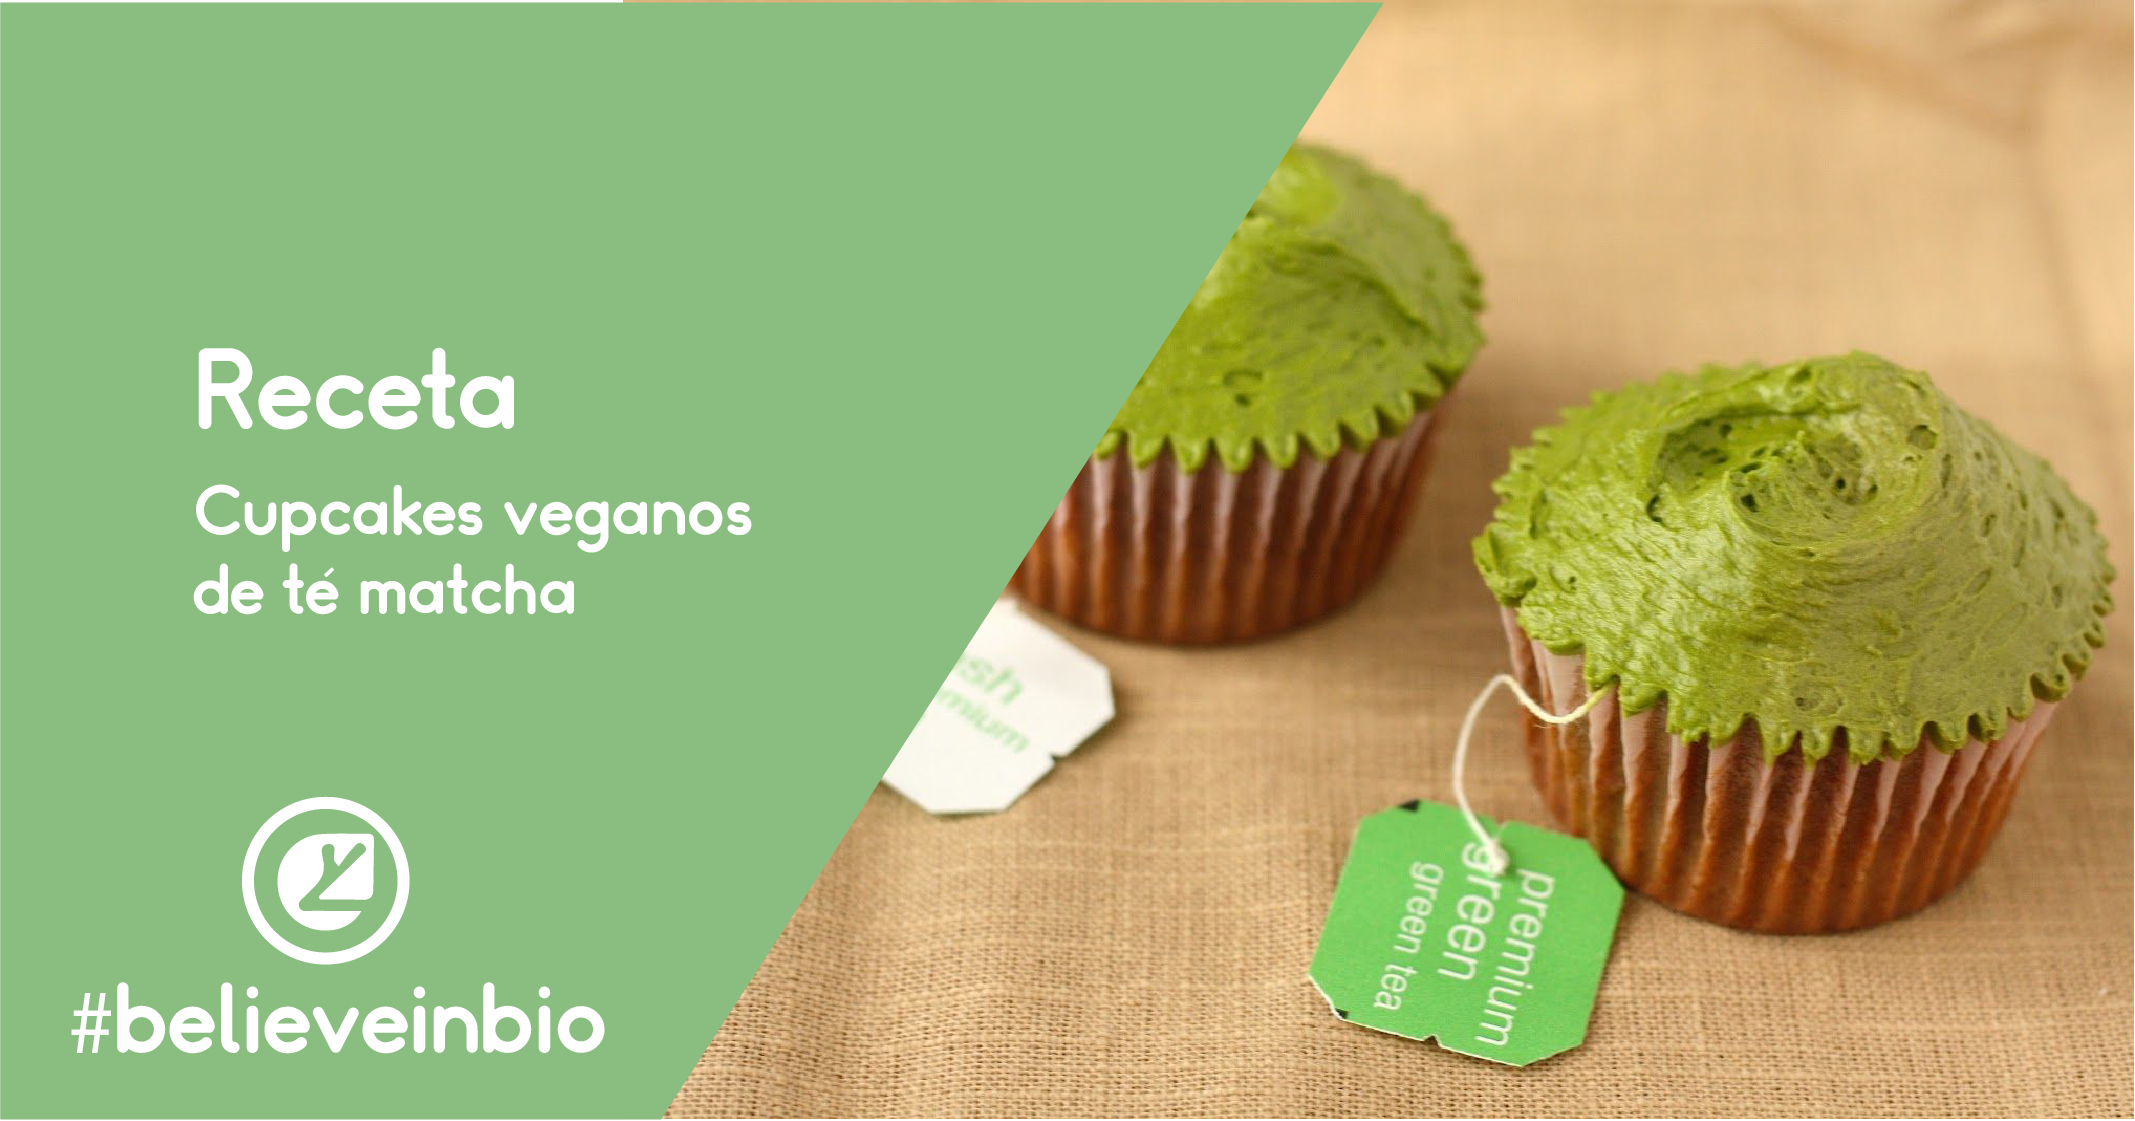 Cupcakes veganos de te matcha